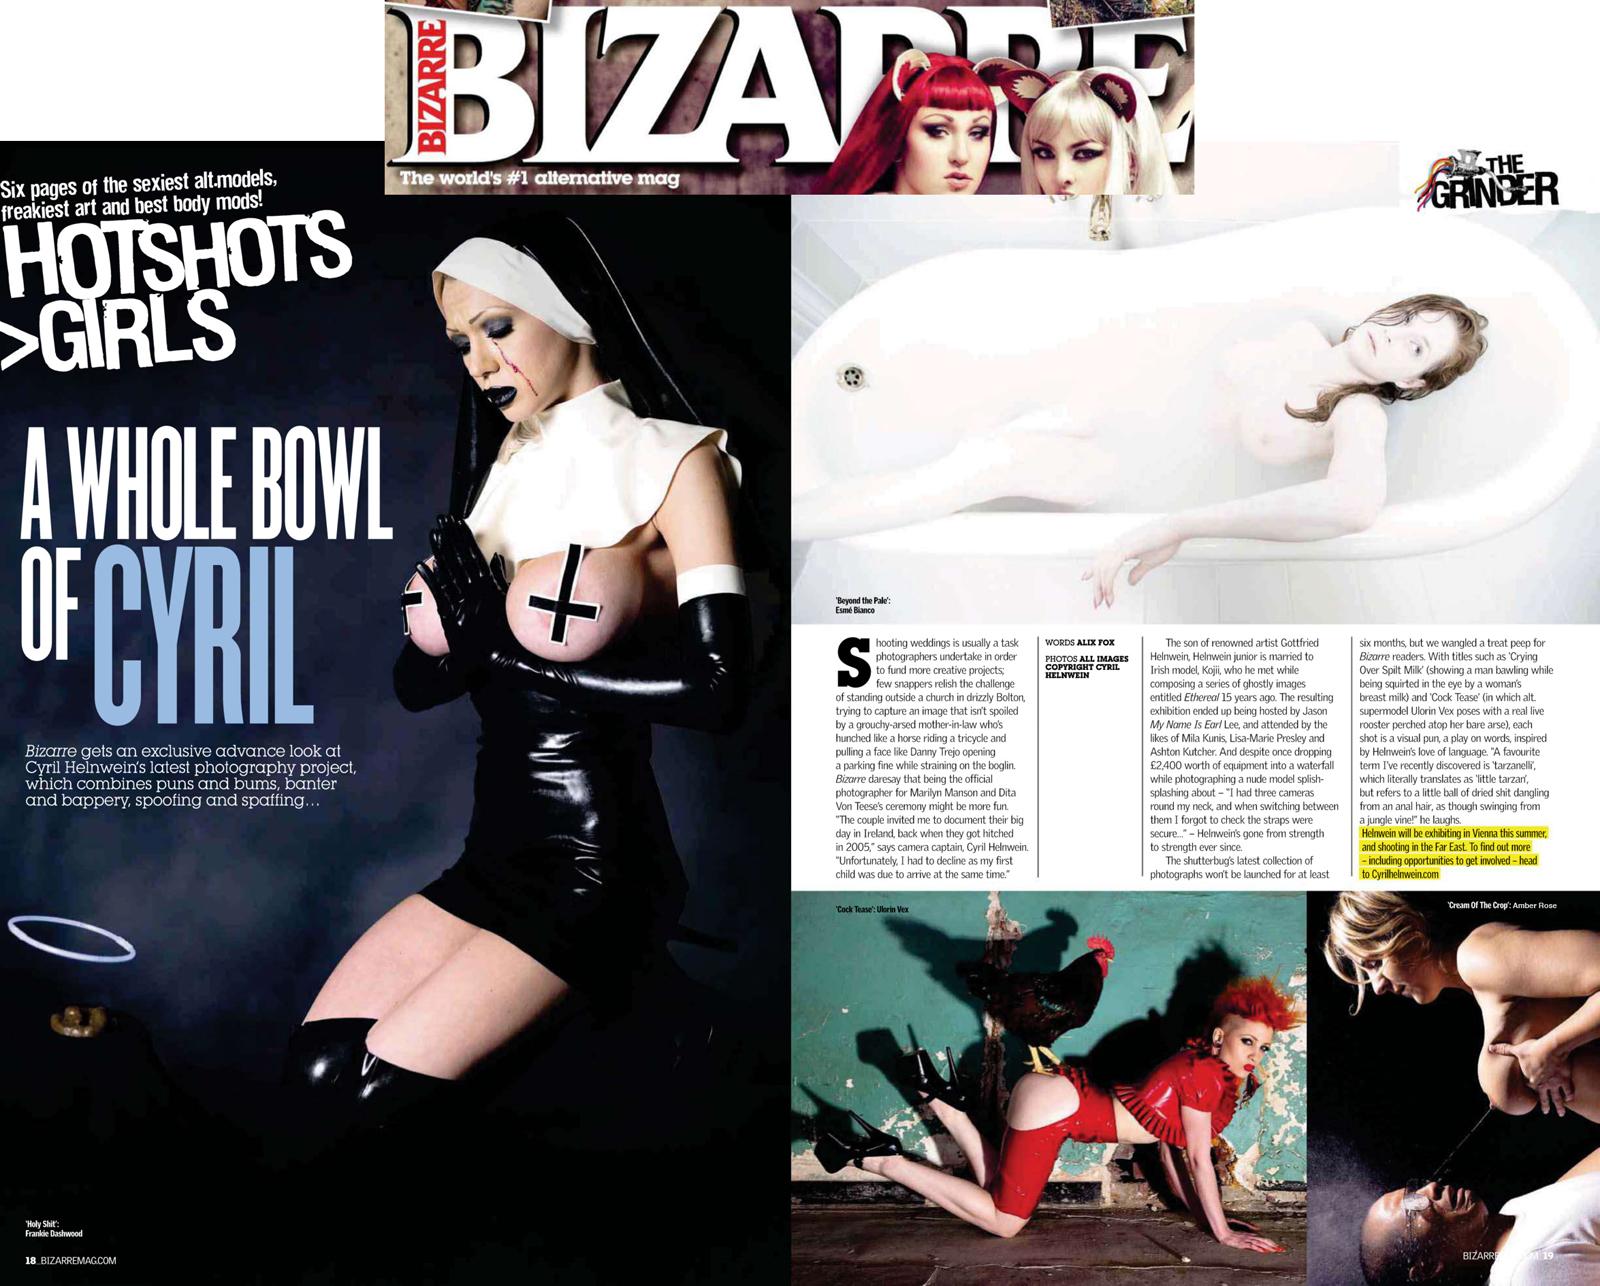 Bizarre Magazine article and interview Cyril Helnwein